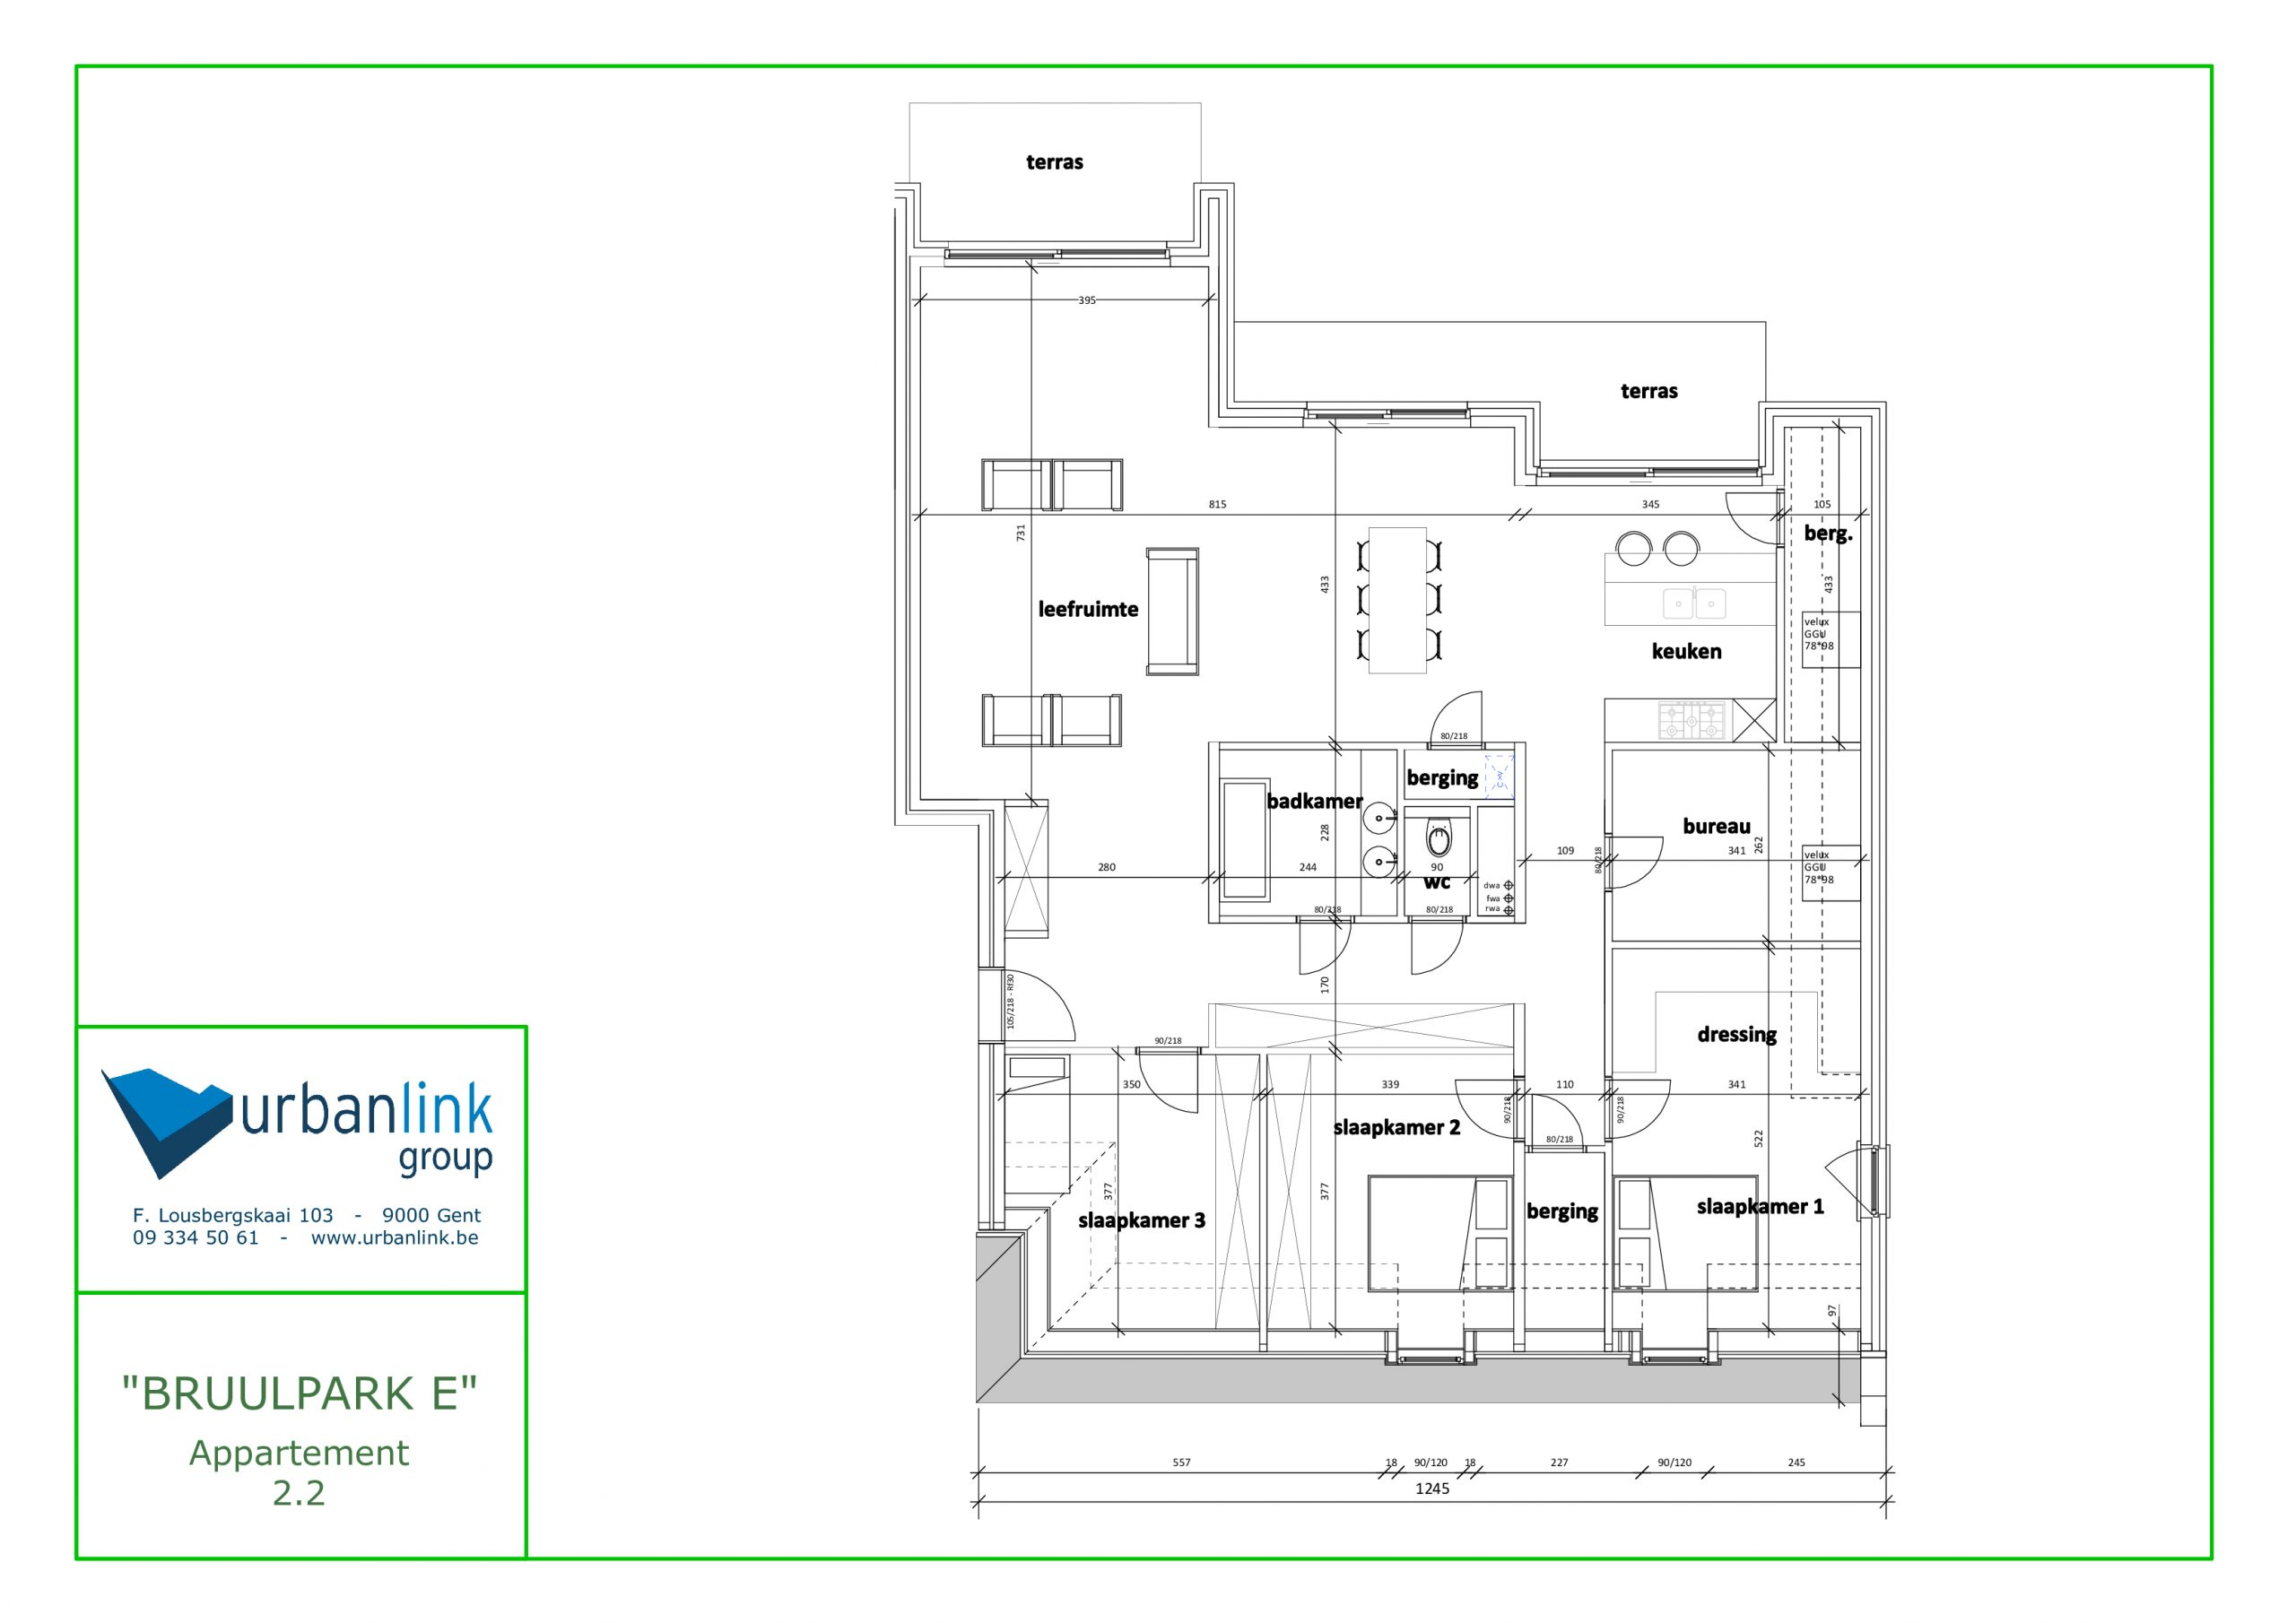 Appartement 2.2